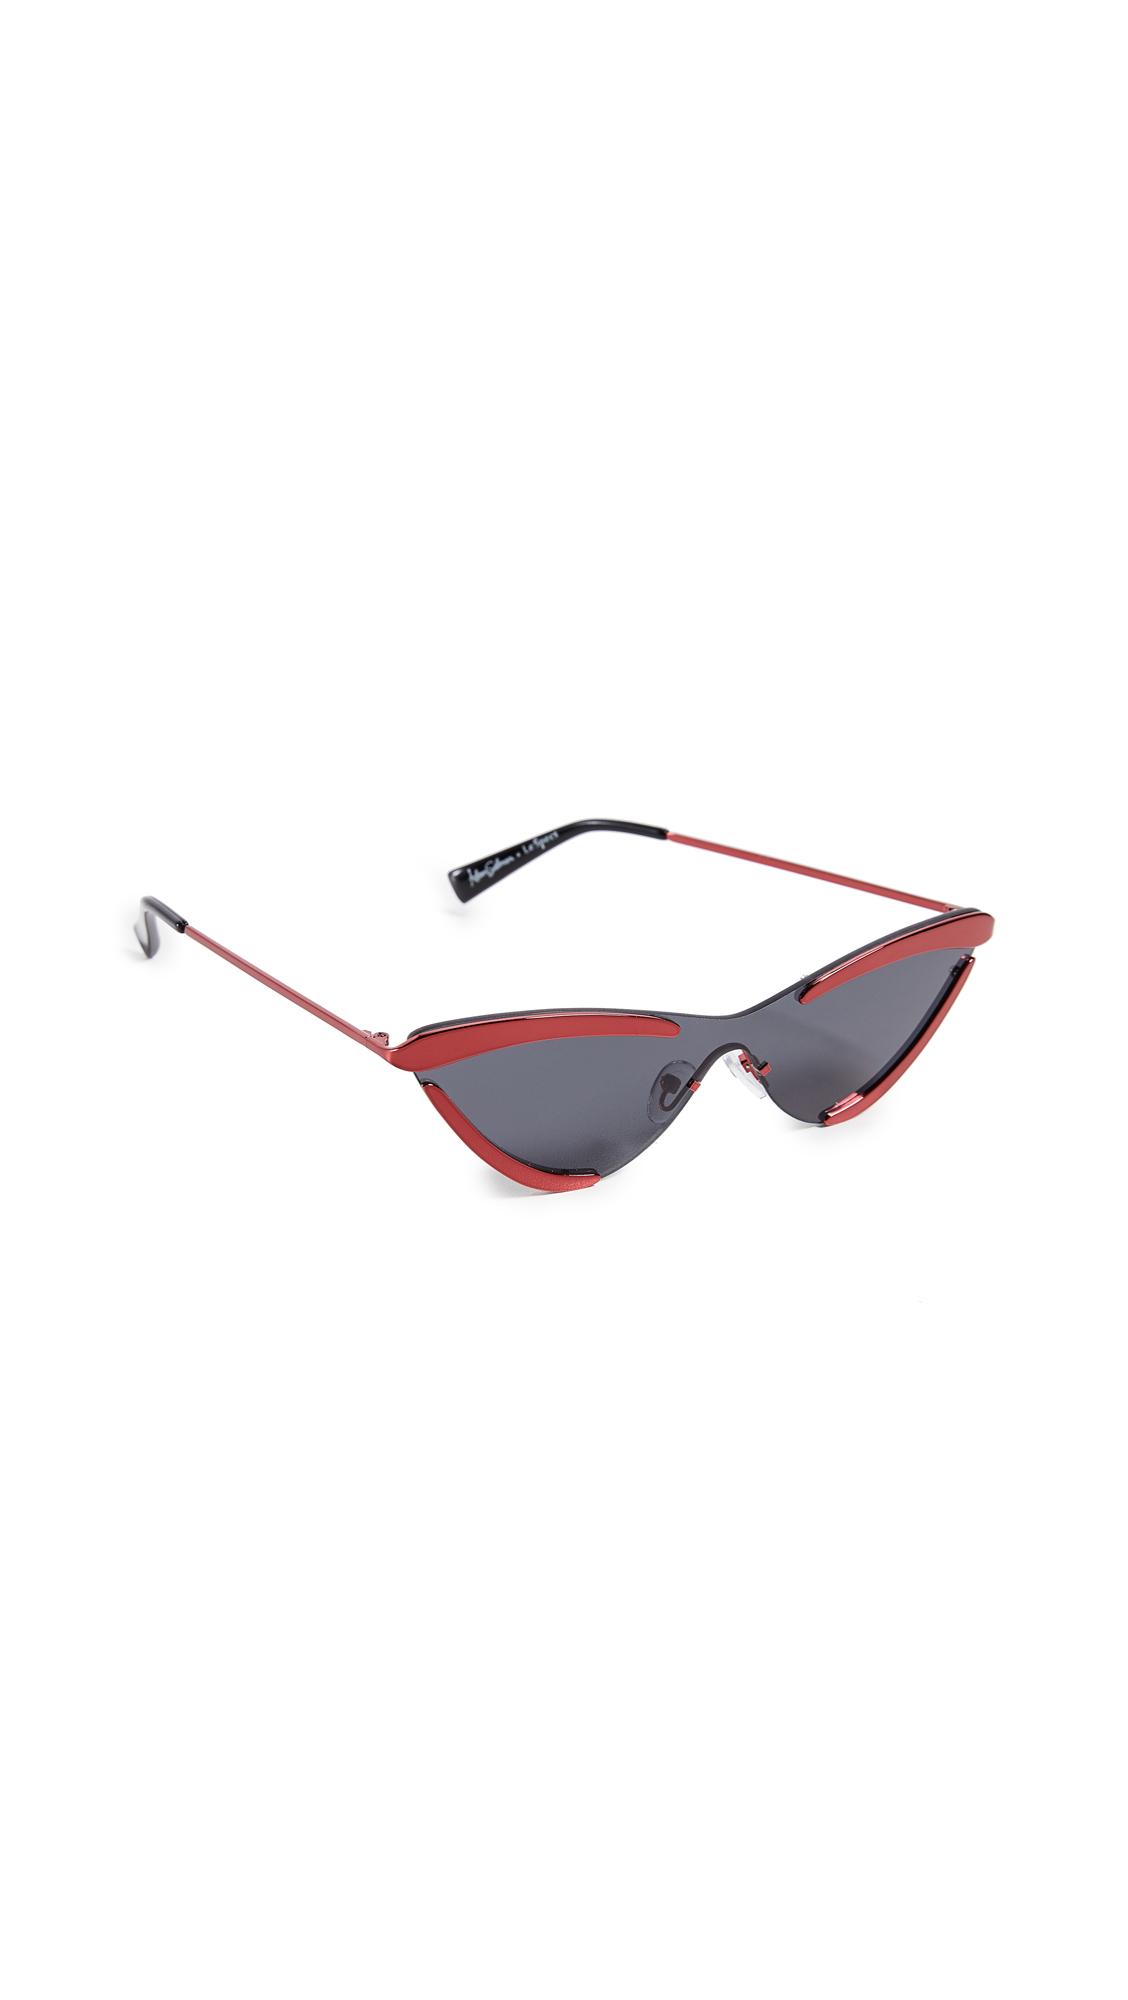 ADAM SELMAN The Scandal Sunglasses in Metallic Red